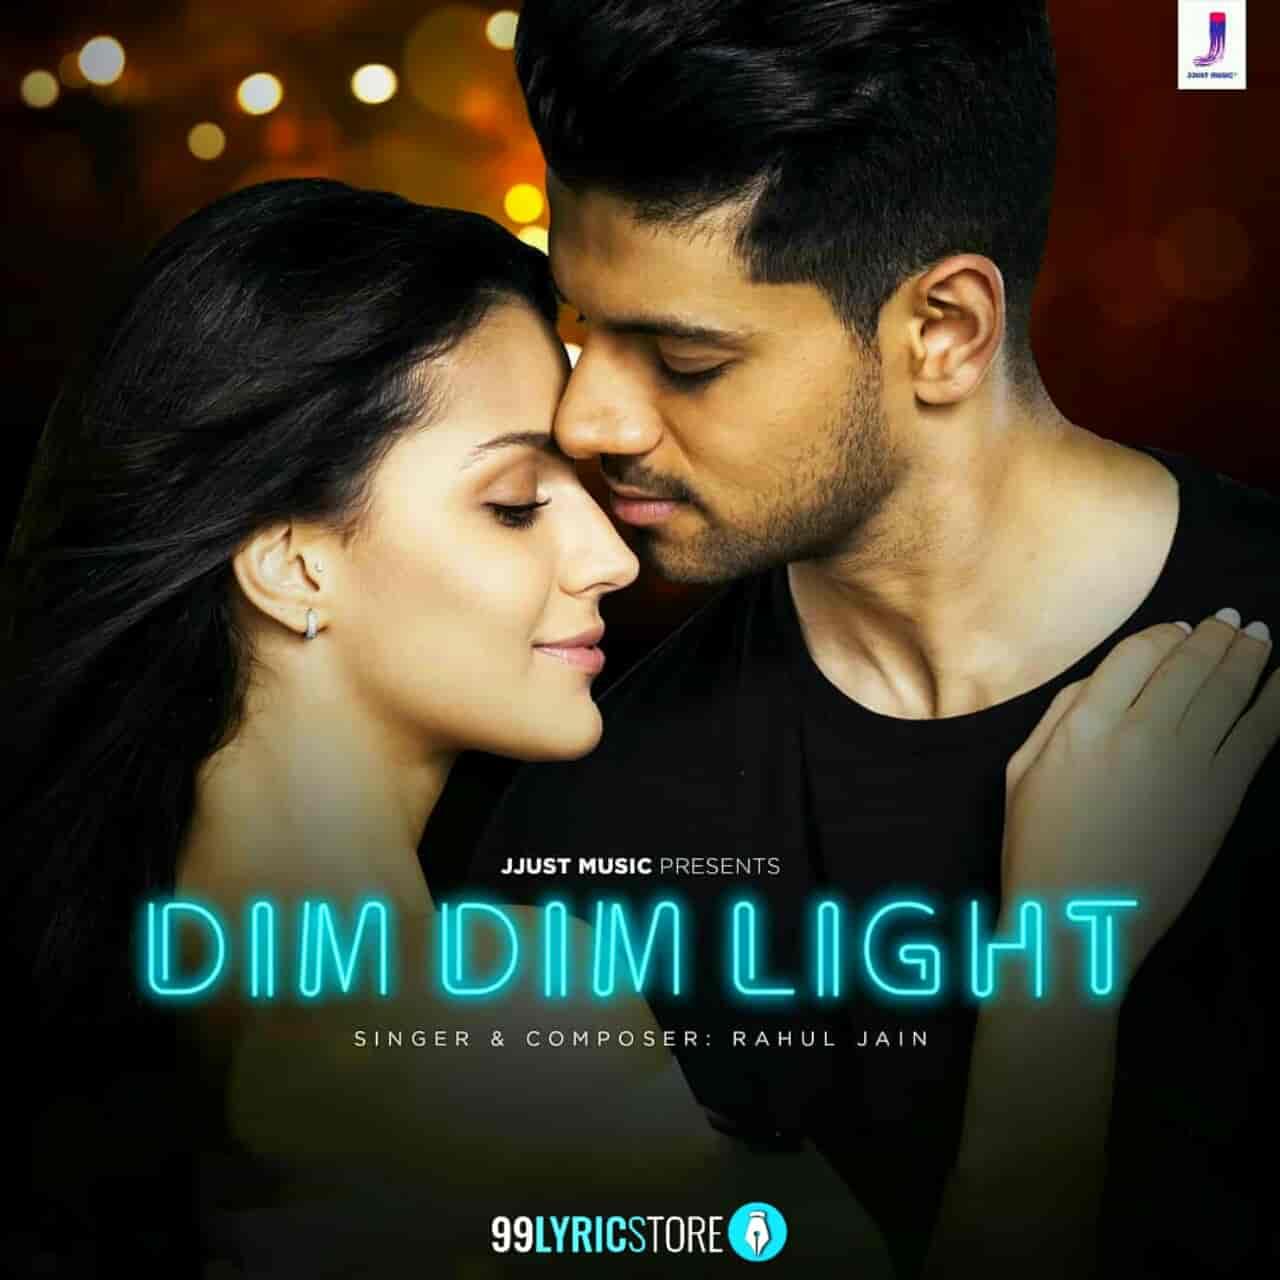 Dim Dim Light Song images by Rahul Jain